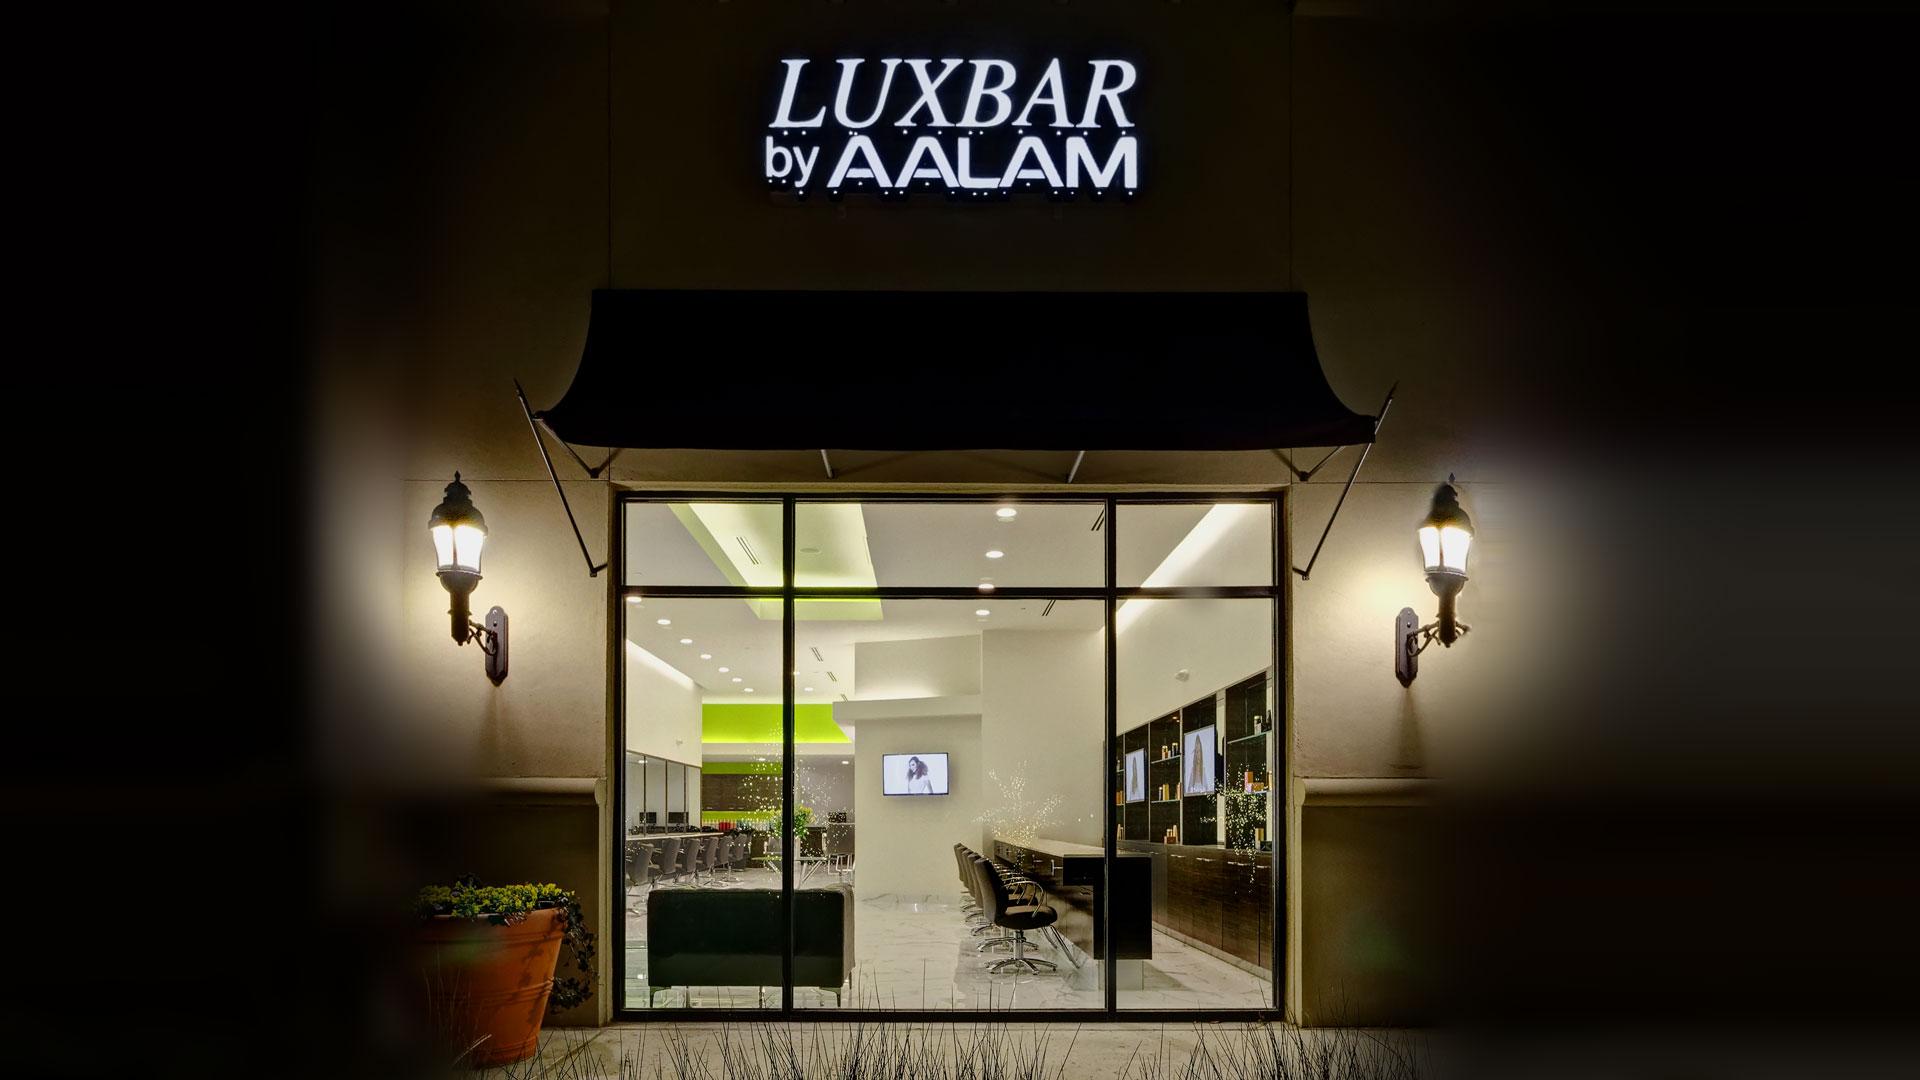 Luxbar plano frisco blow dry bar makeup bar in north for Aalam salon dallas